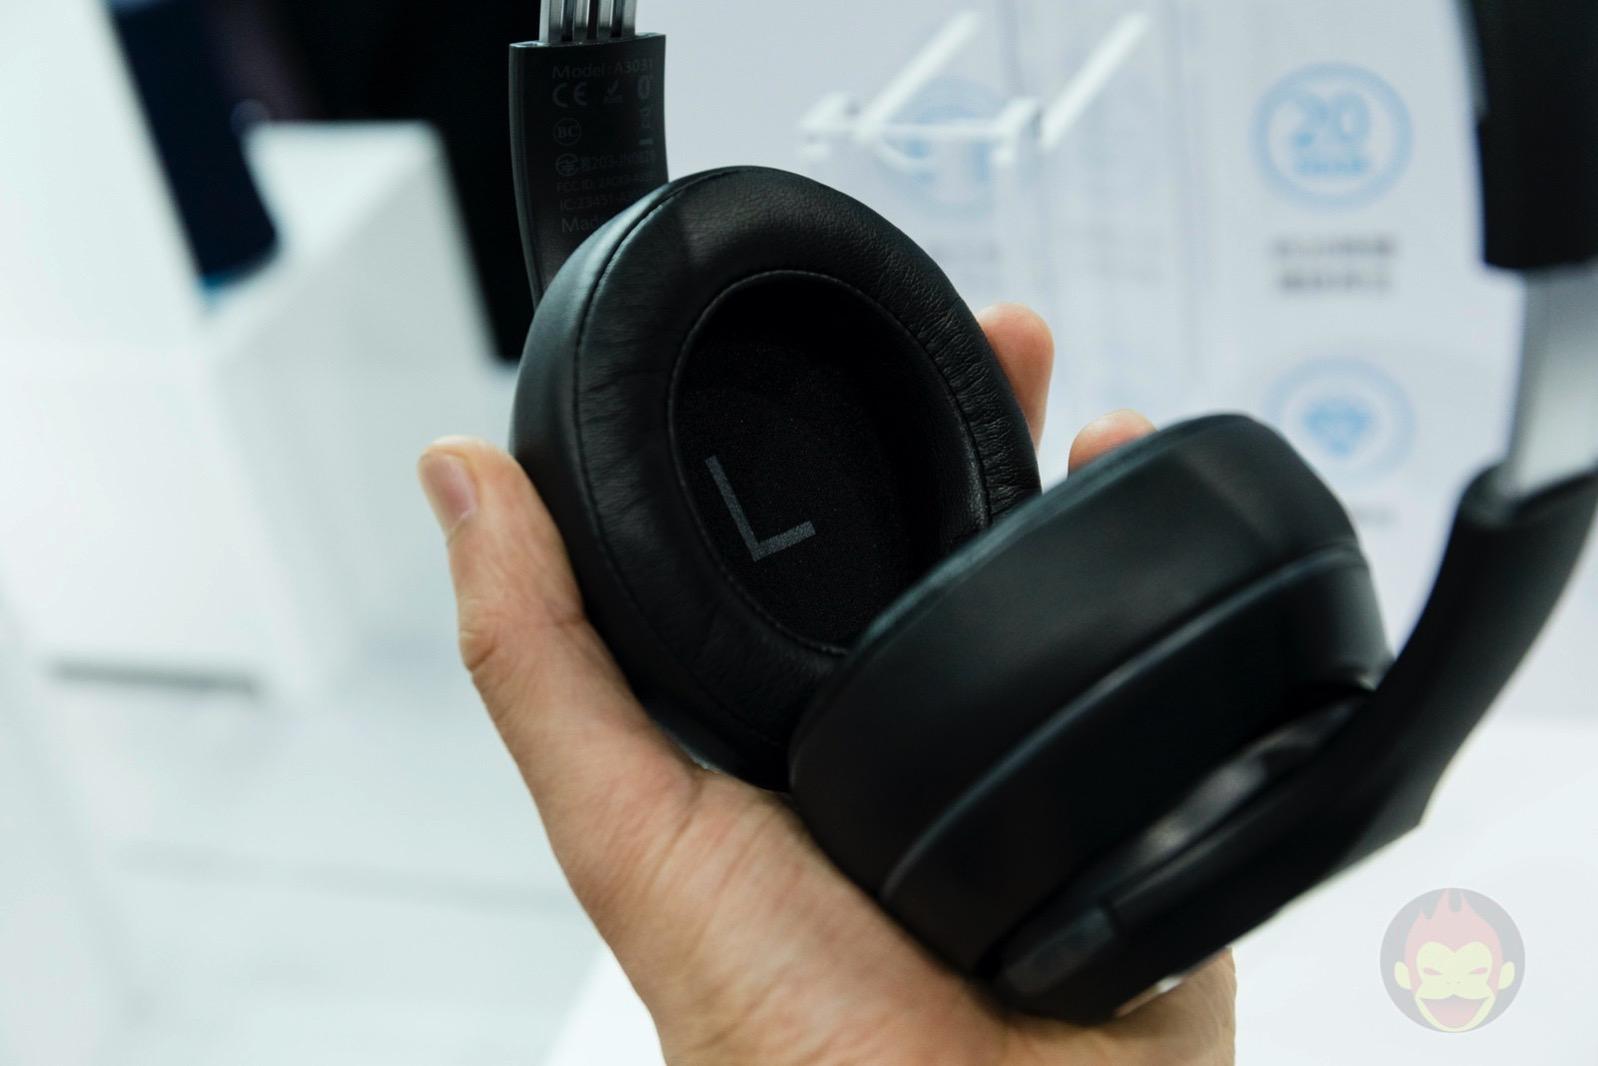 Anker-SoundCore-Vortex-05.jpg